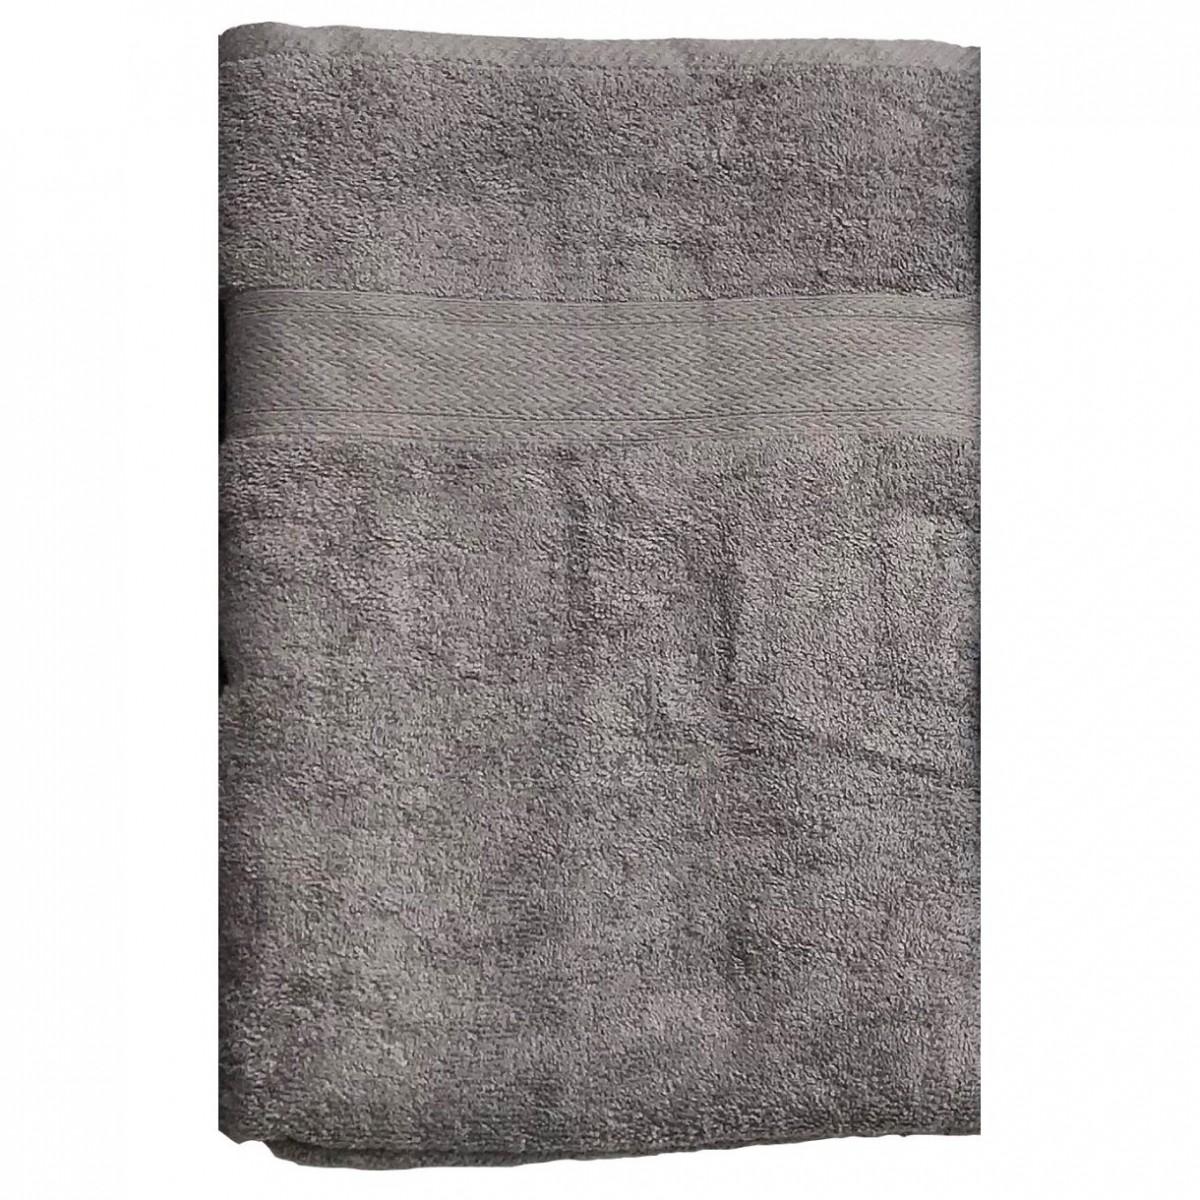 CONZEPT Håndklæde 50 x 100 cm grå